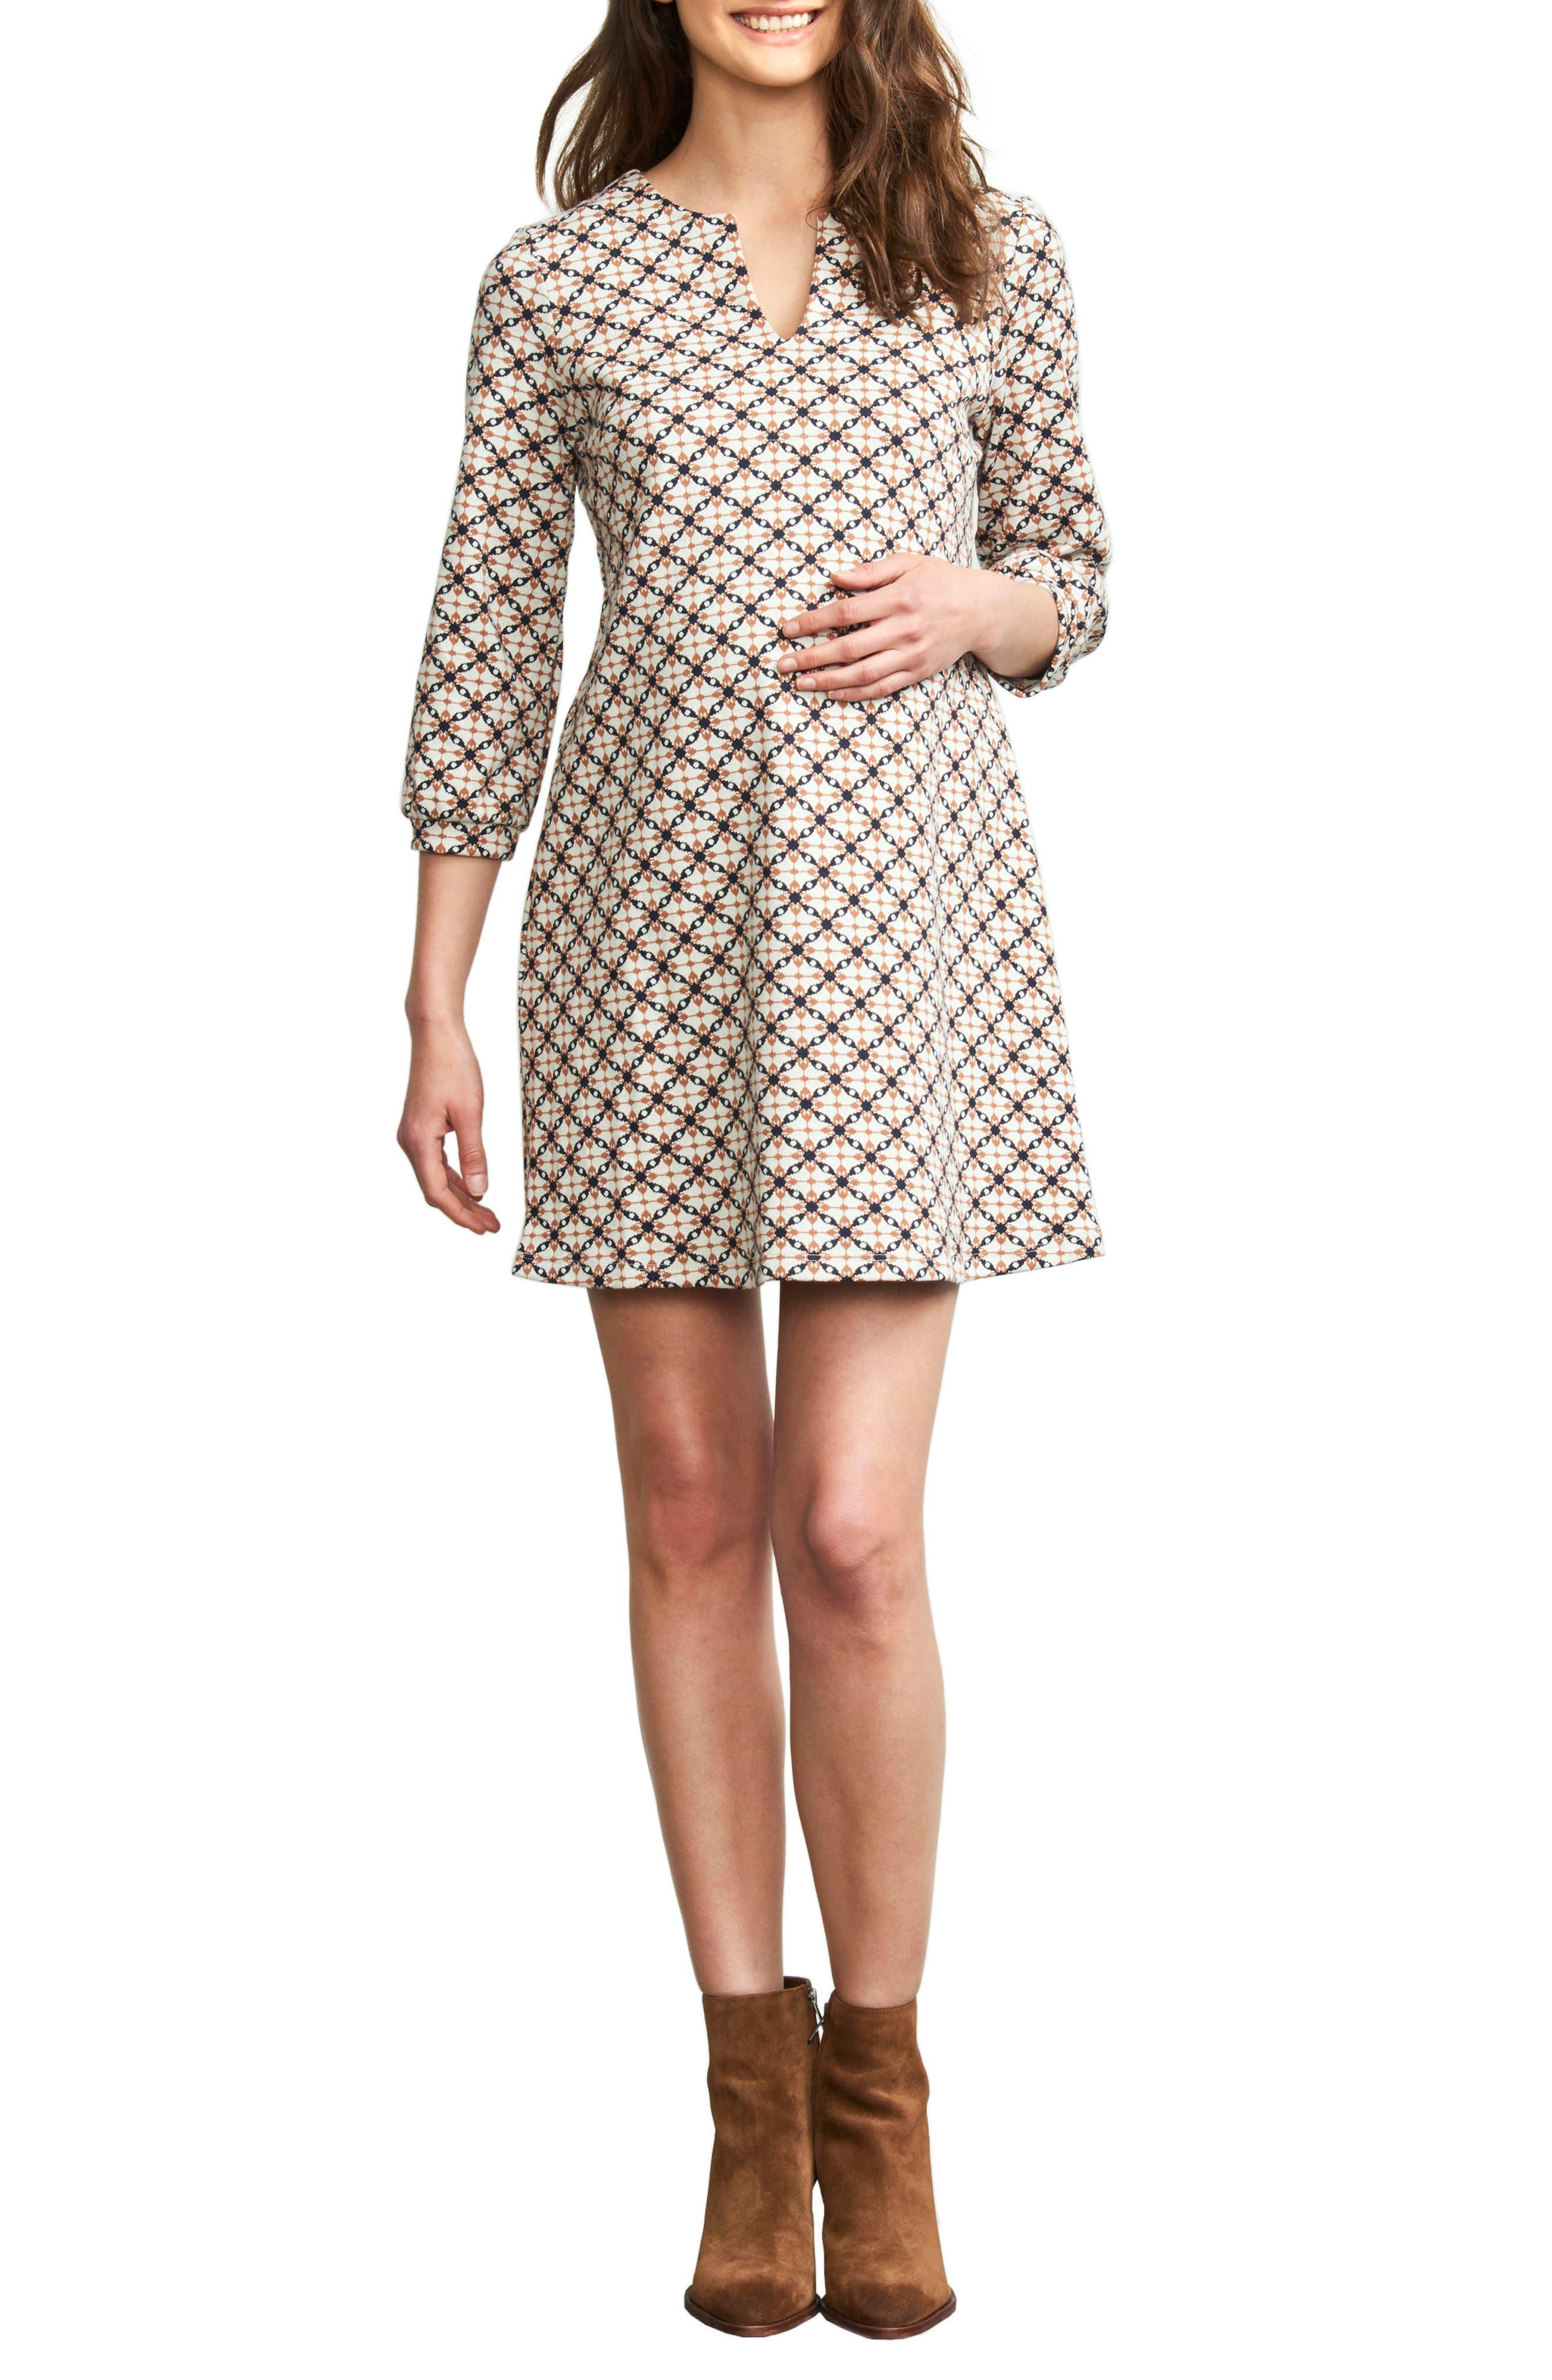 Main Image - Maternal America 'Vintage Pearls' Maternity Dress